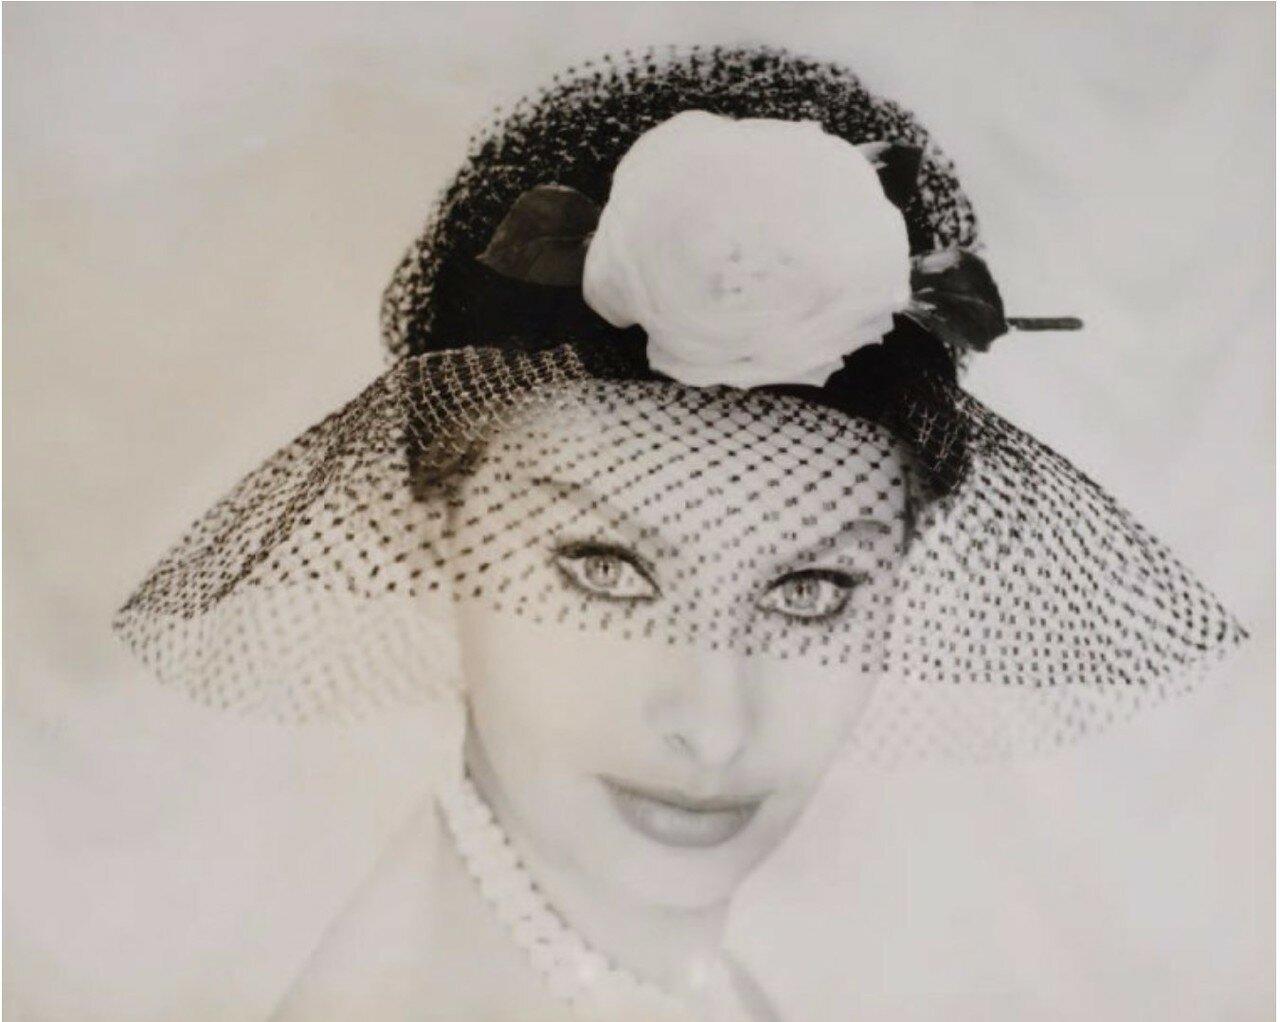 1950. София Лорен